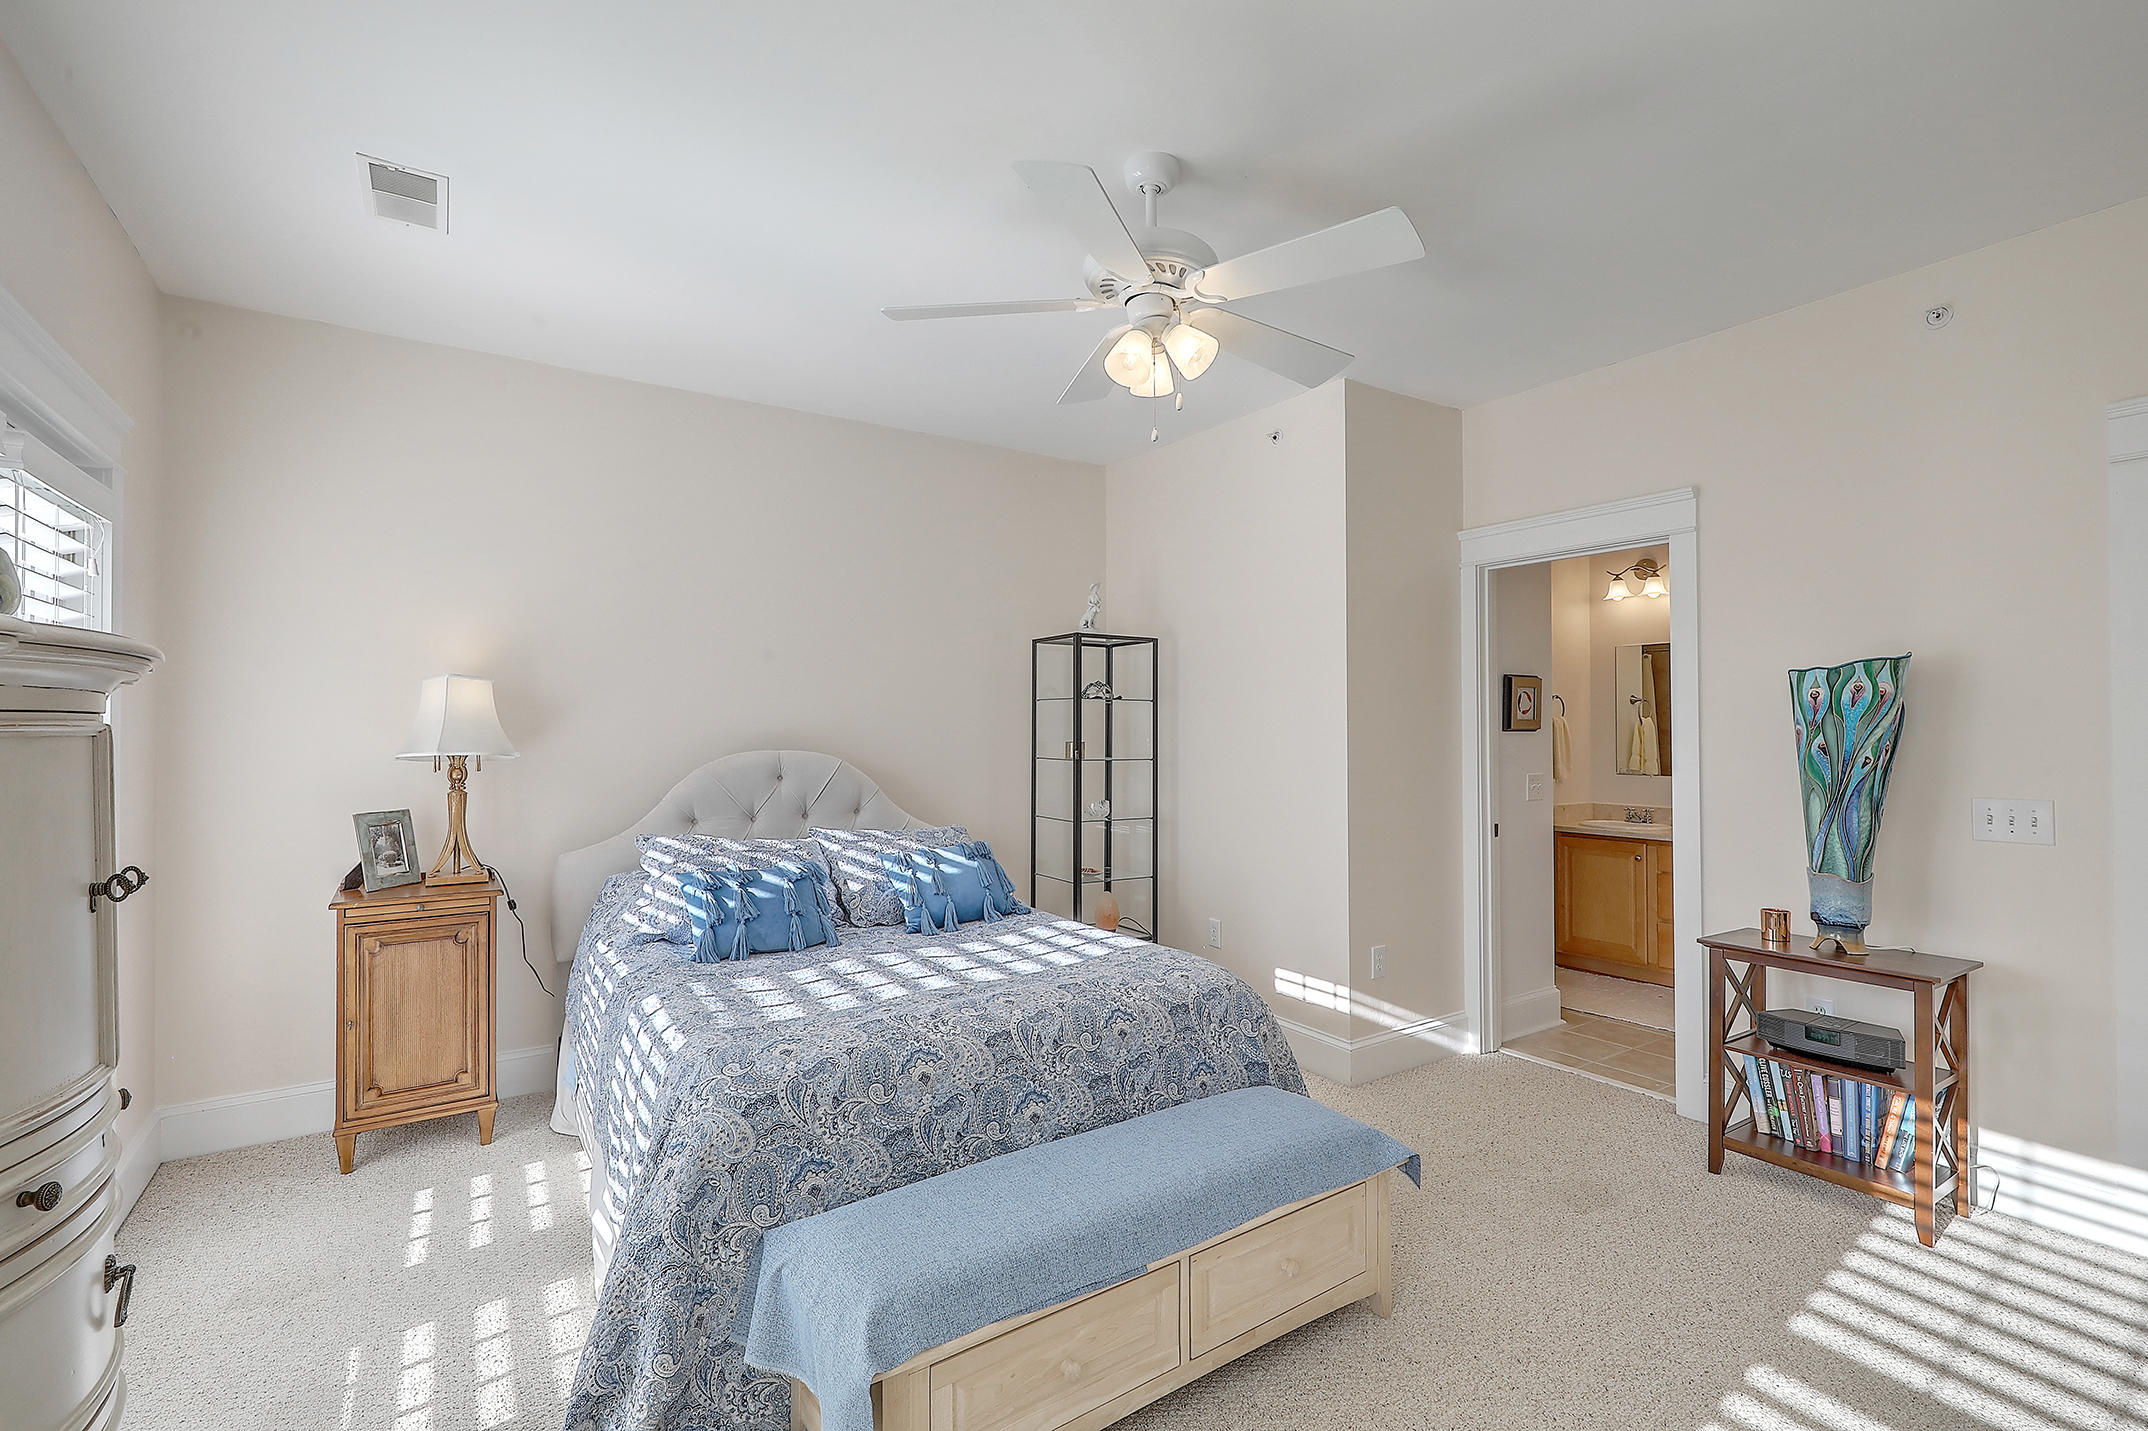 Etiwan Pointe Homes For Sale - 124 Winding Creek, Mount Pleasant, SC - 17